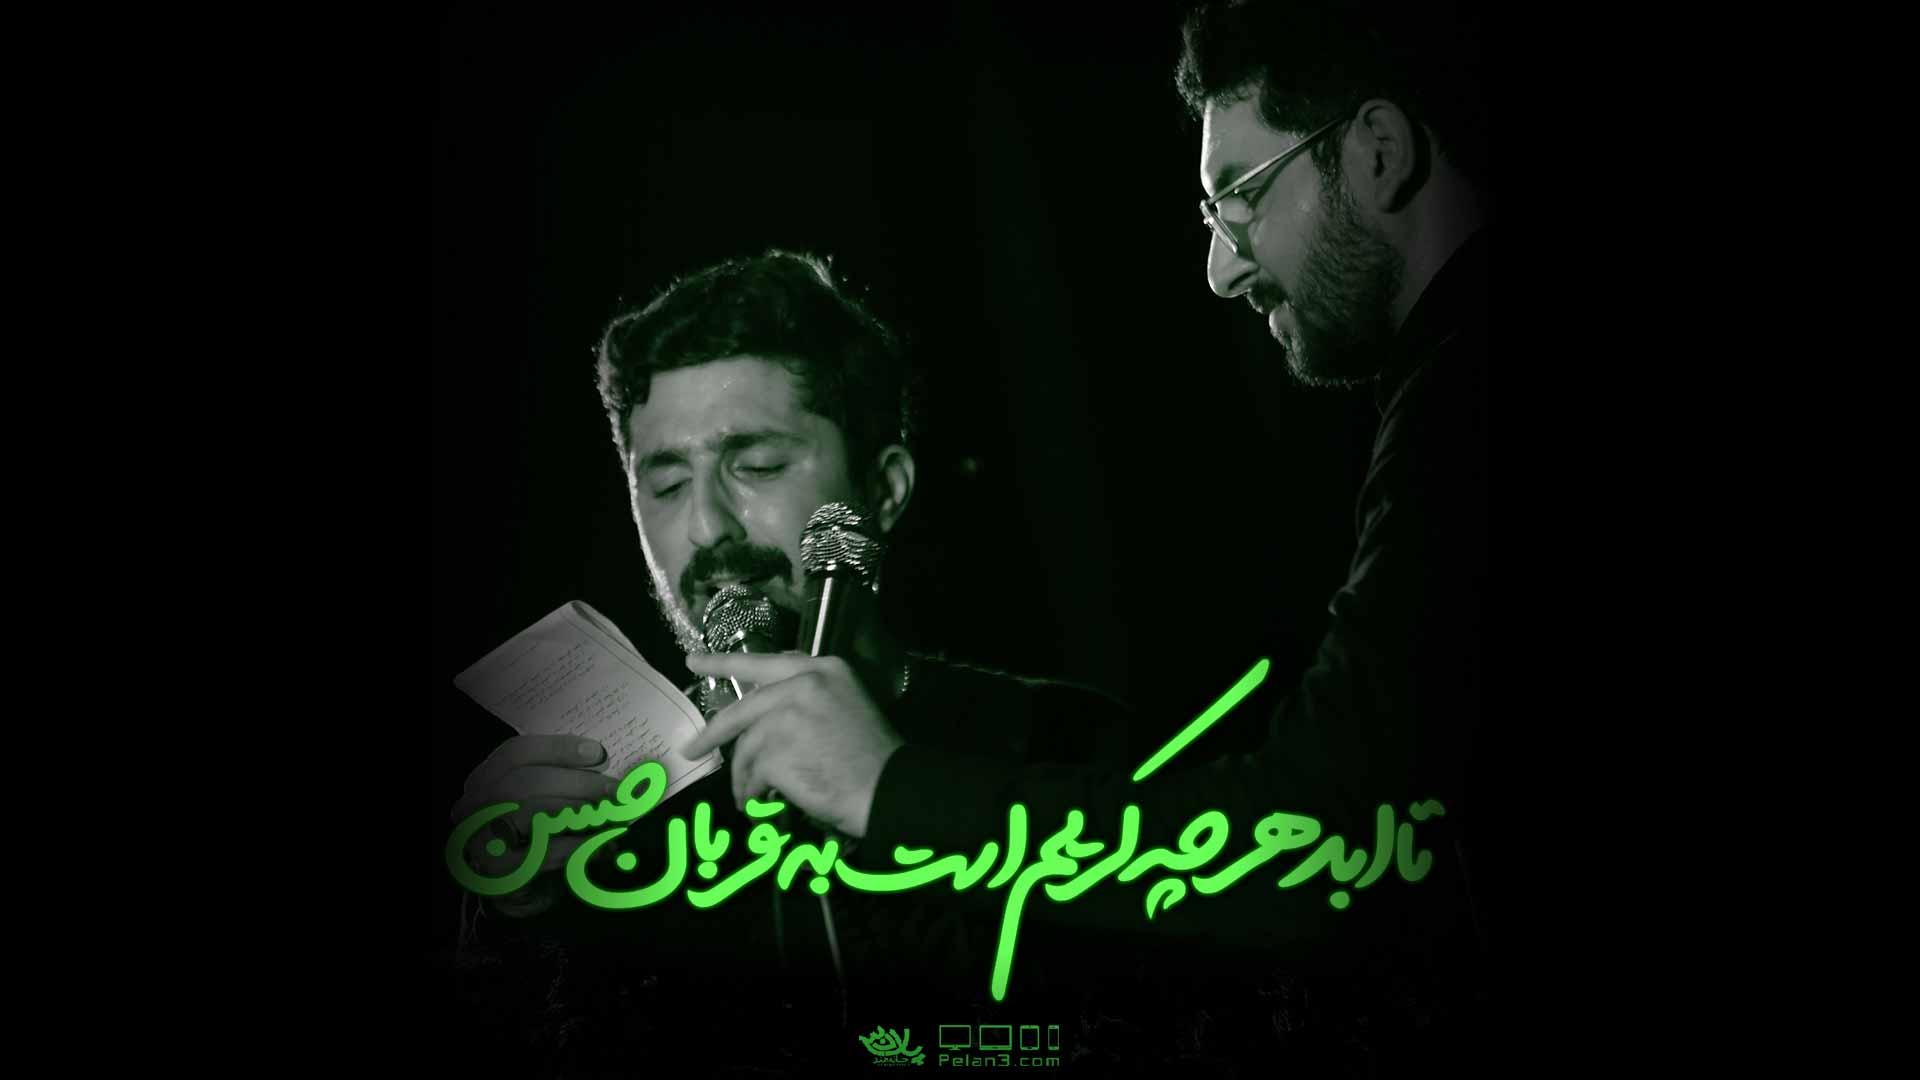 دستمو دامان حسن حائری کیانی